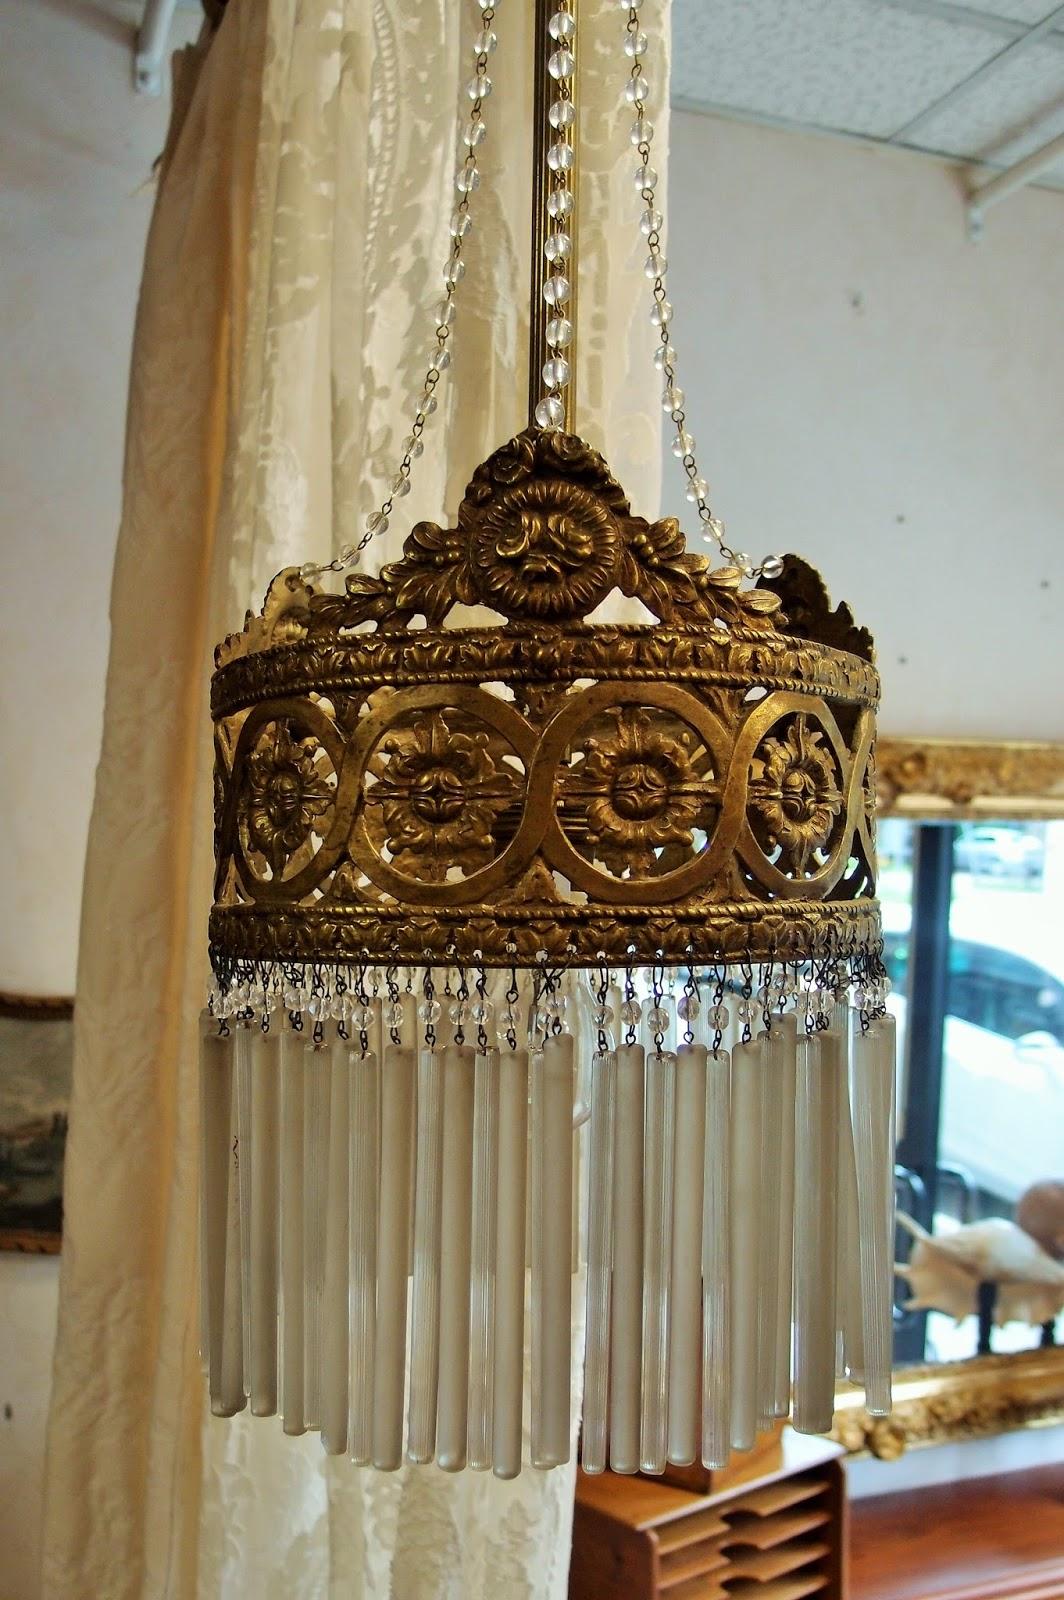 Lampadari antichi   luci romantiche per arredi moderni   Antichit u00e0 Bellini -> Riparazioni Lampadari Antichi